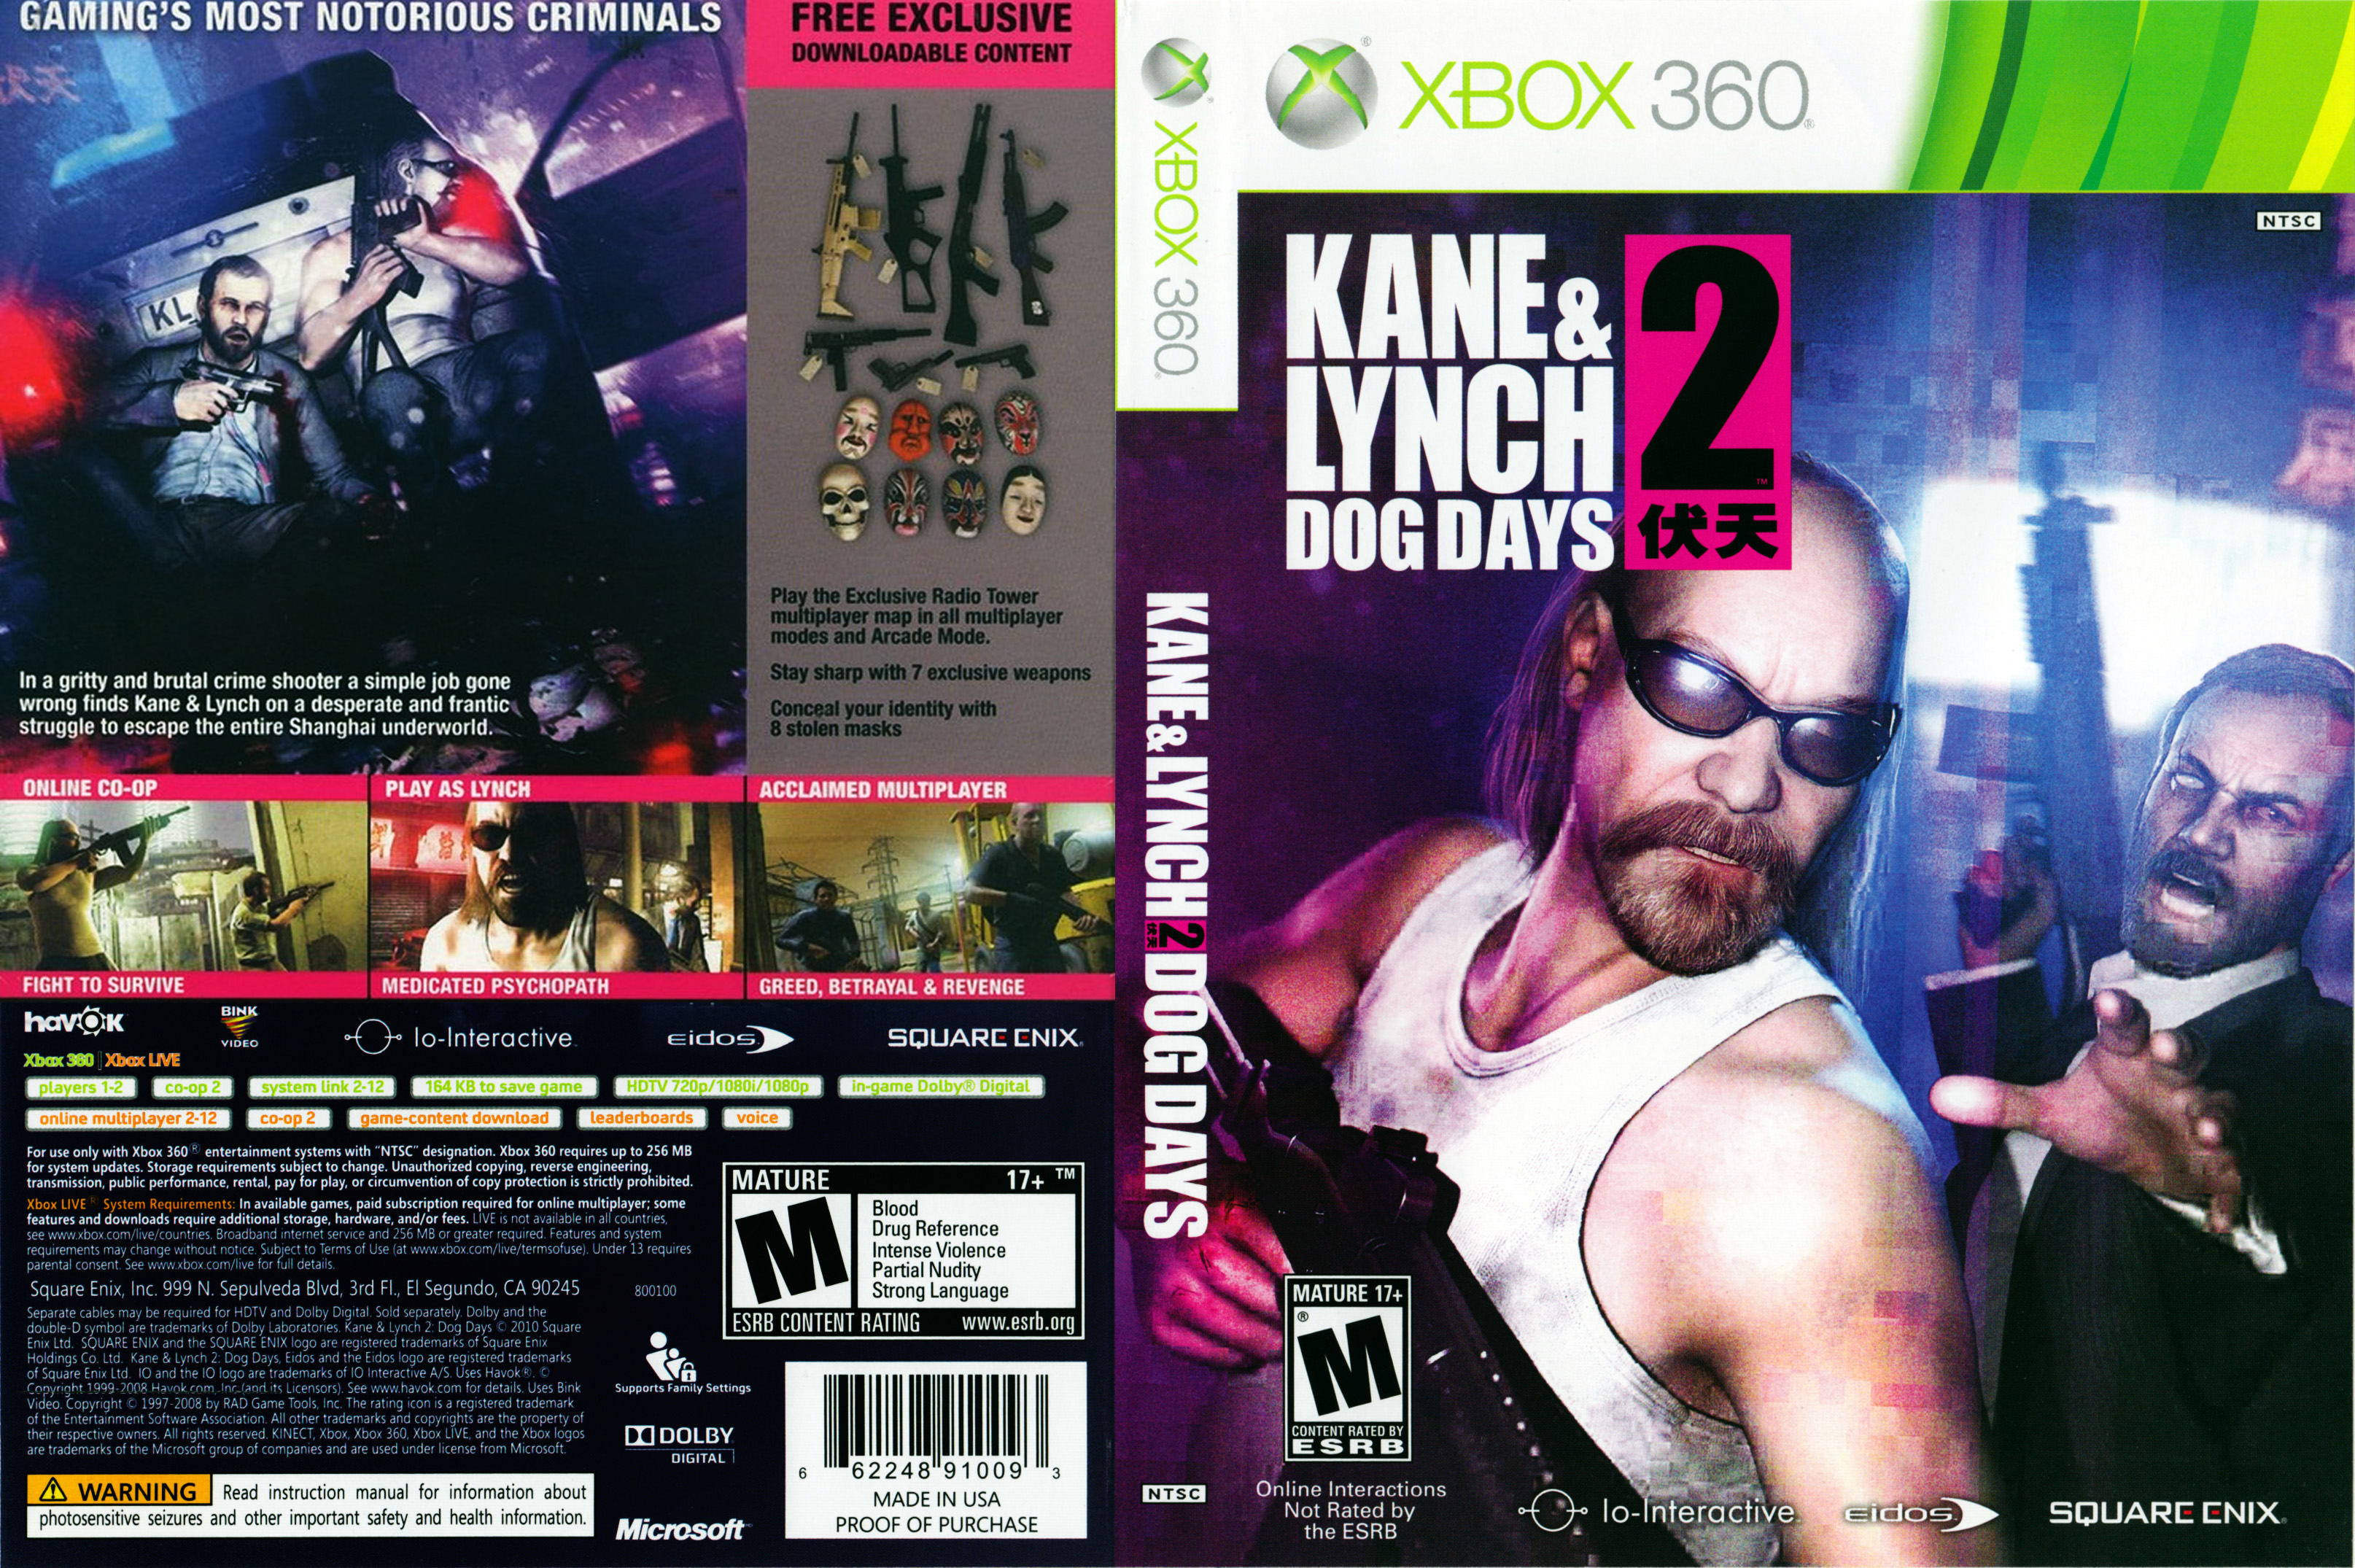 KaneLynch2DogDays